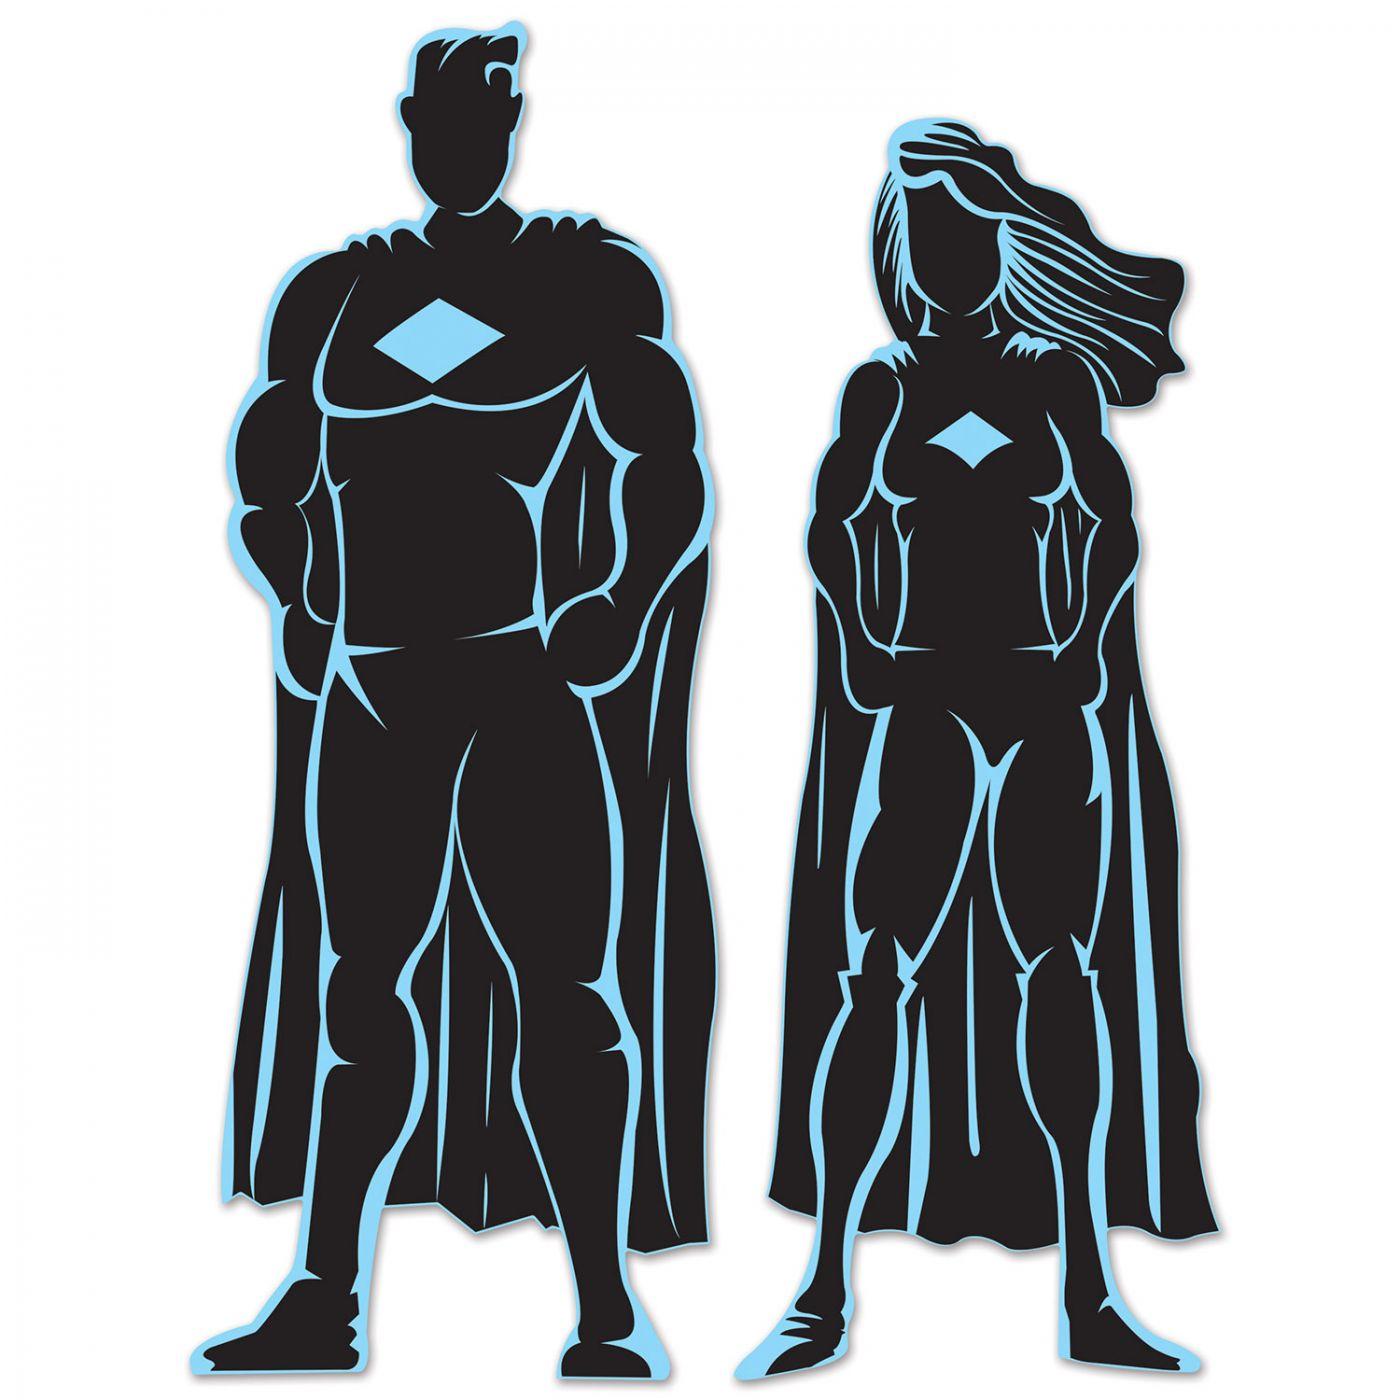 Hero Silhouettes image